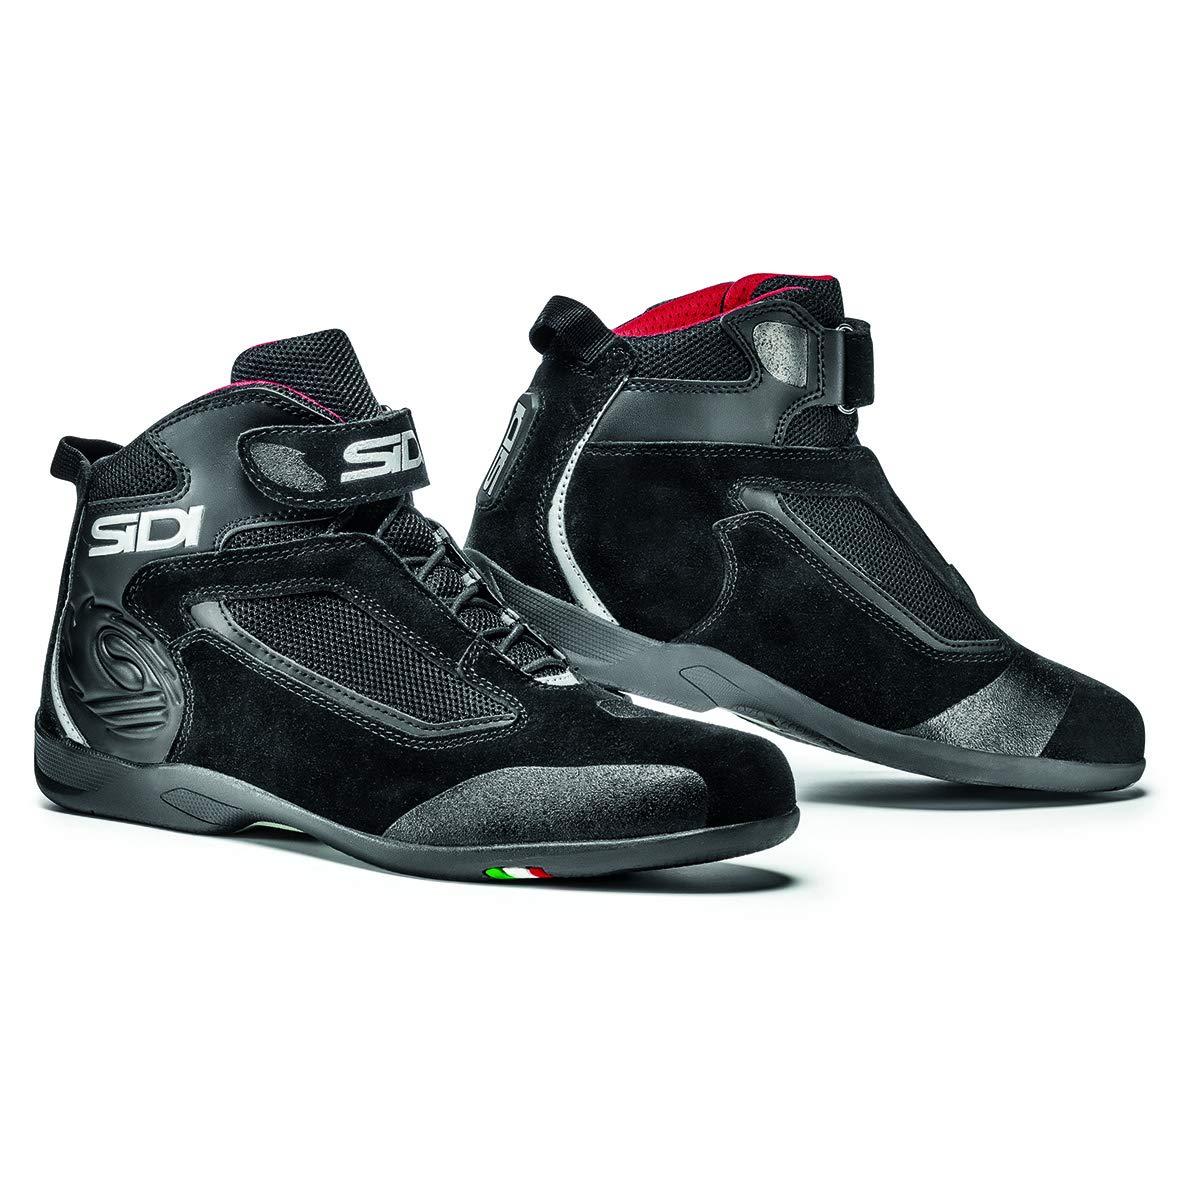 Sidi Gas Motorcycle Riding Shoe Black US10/EU44 (More Size Options)